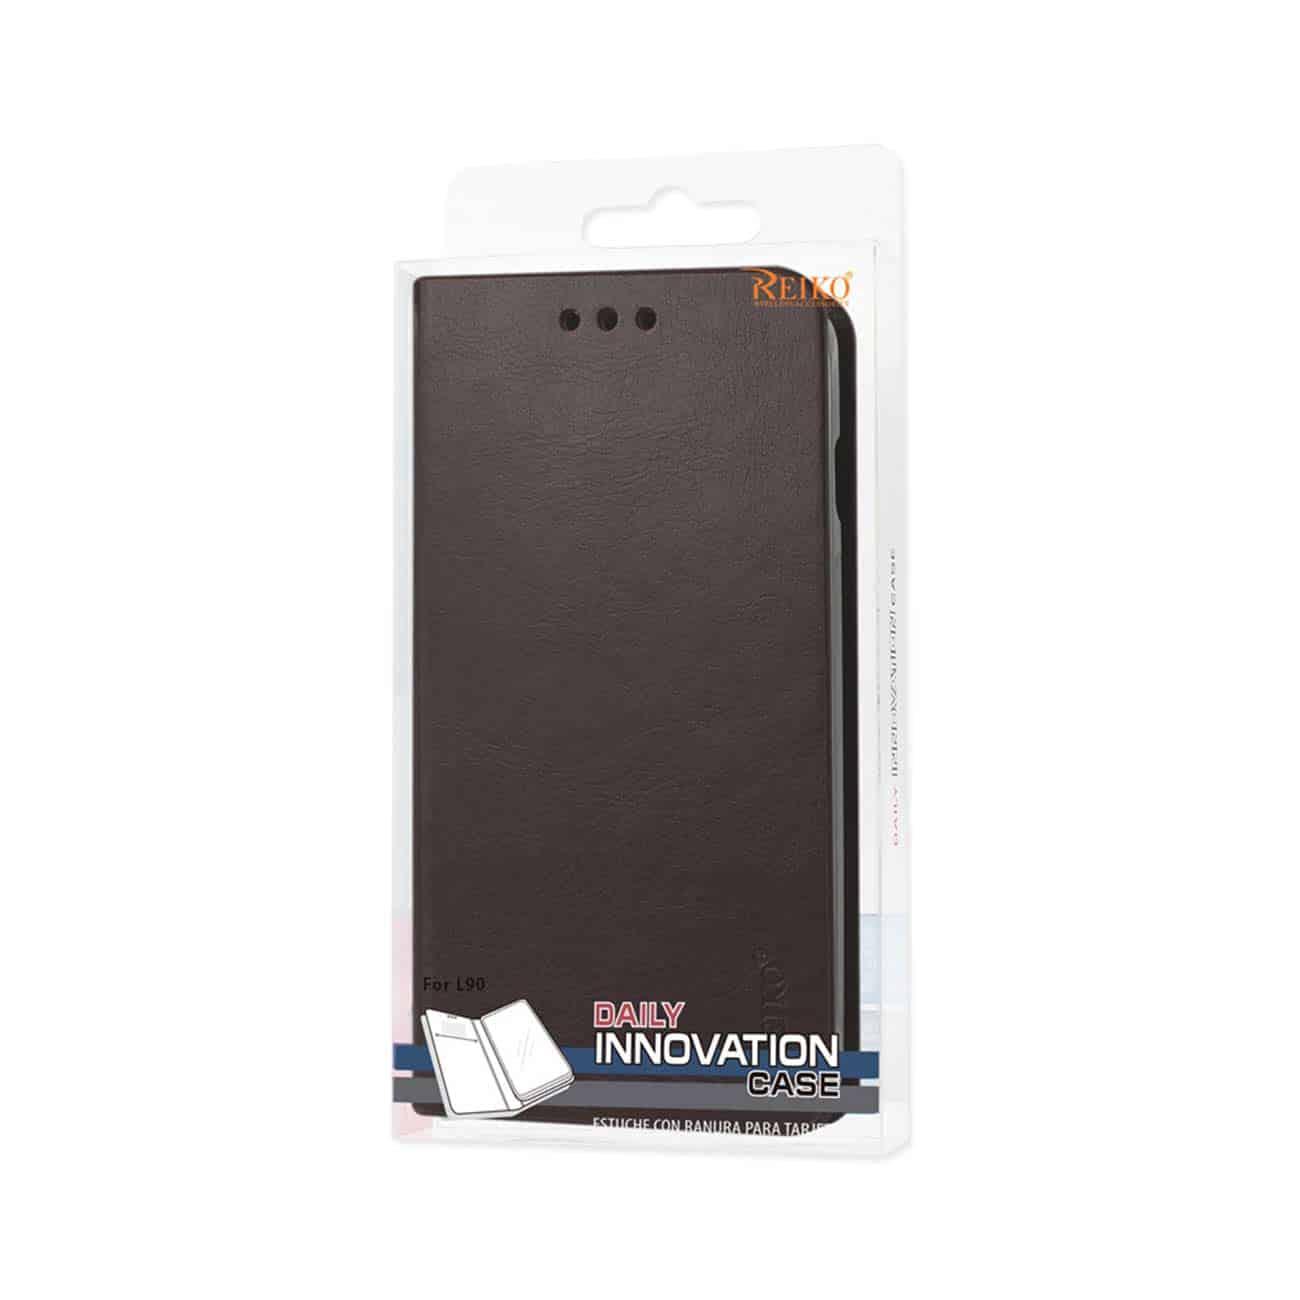 LG L90 FLIP FOLIO CASE WITH CARD HOLDER IN BROWN